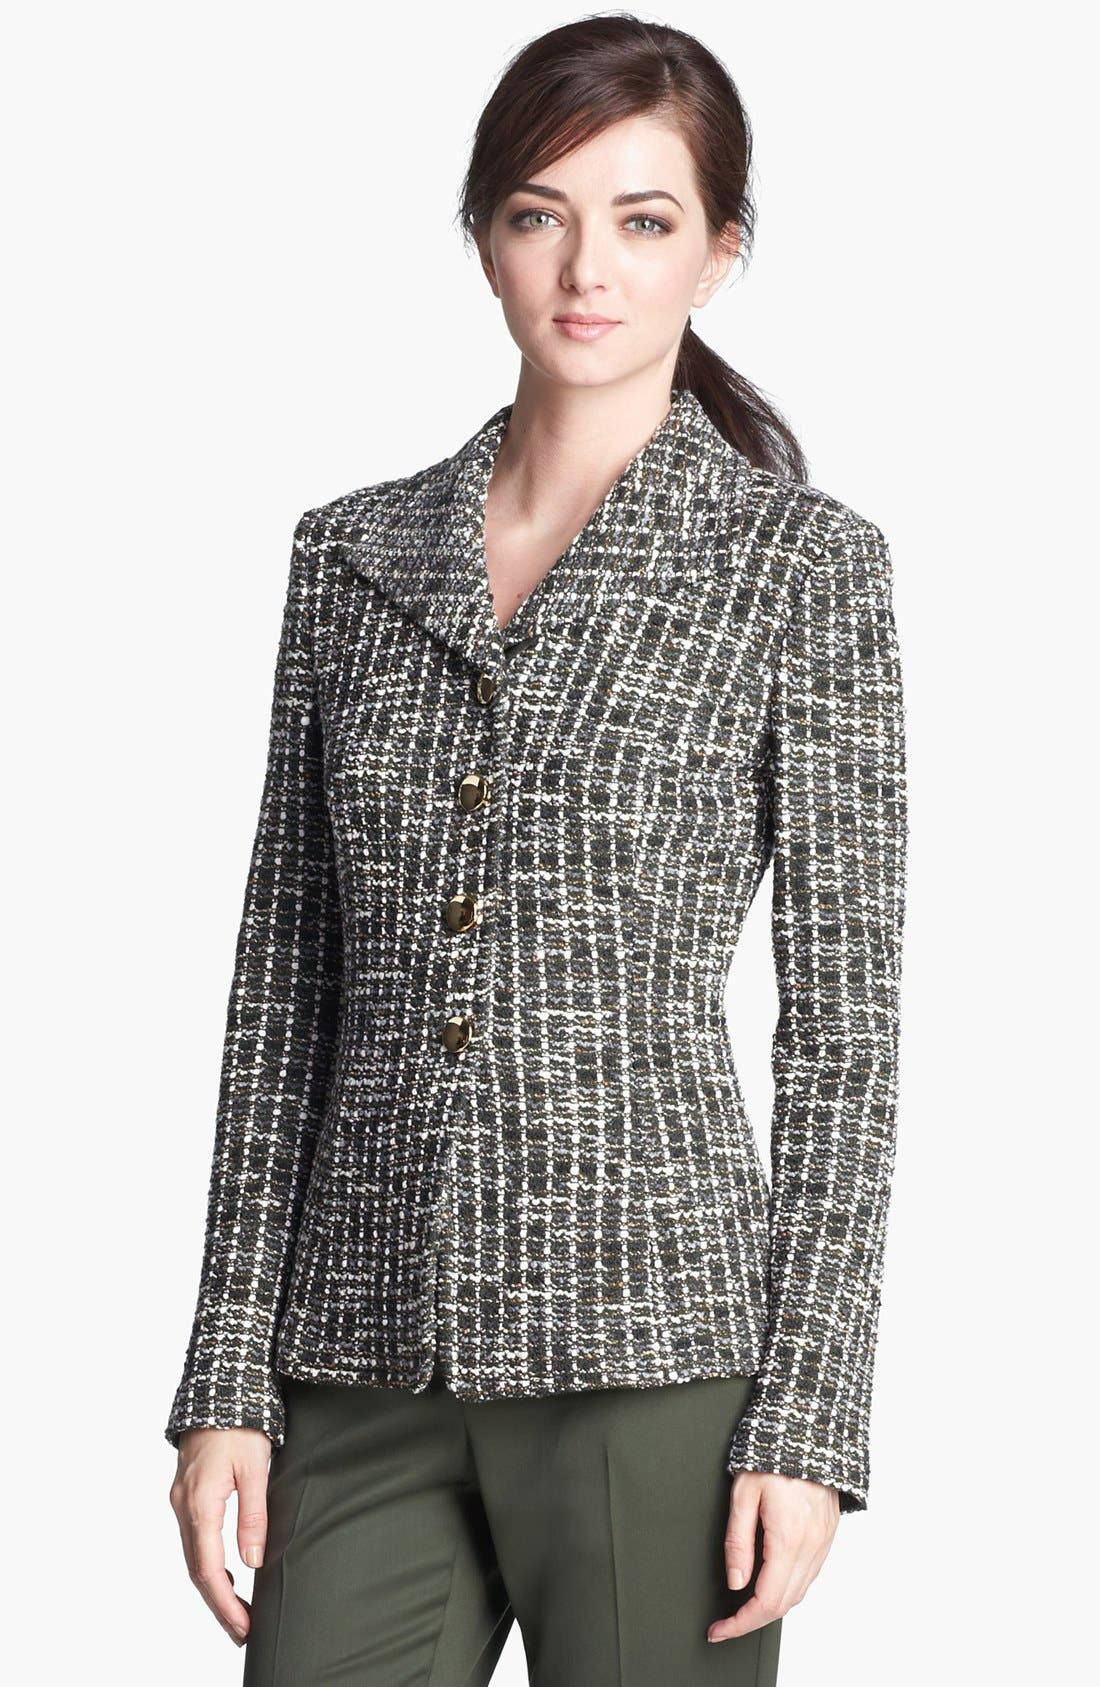 Main Image - St. John Collection Loden Check Tweed Knit Jacket